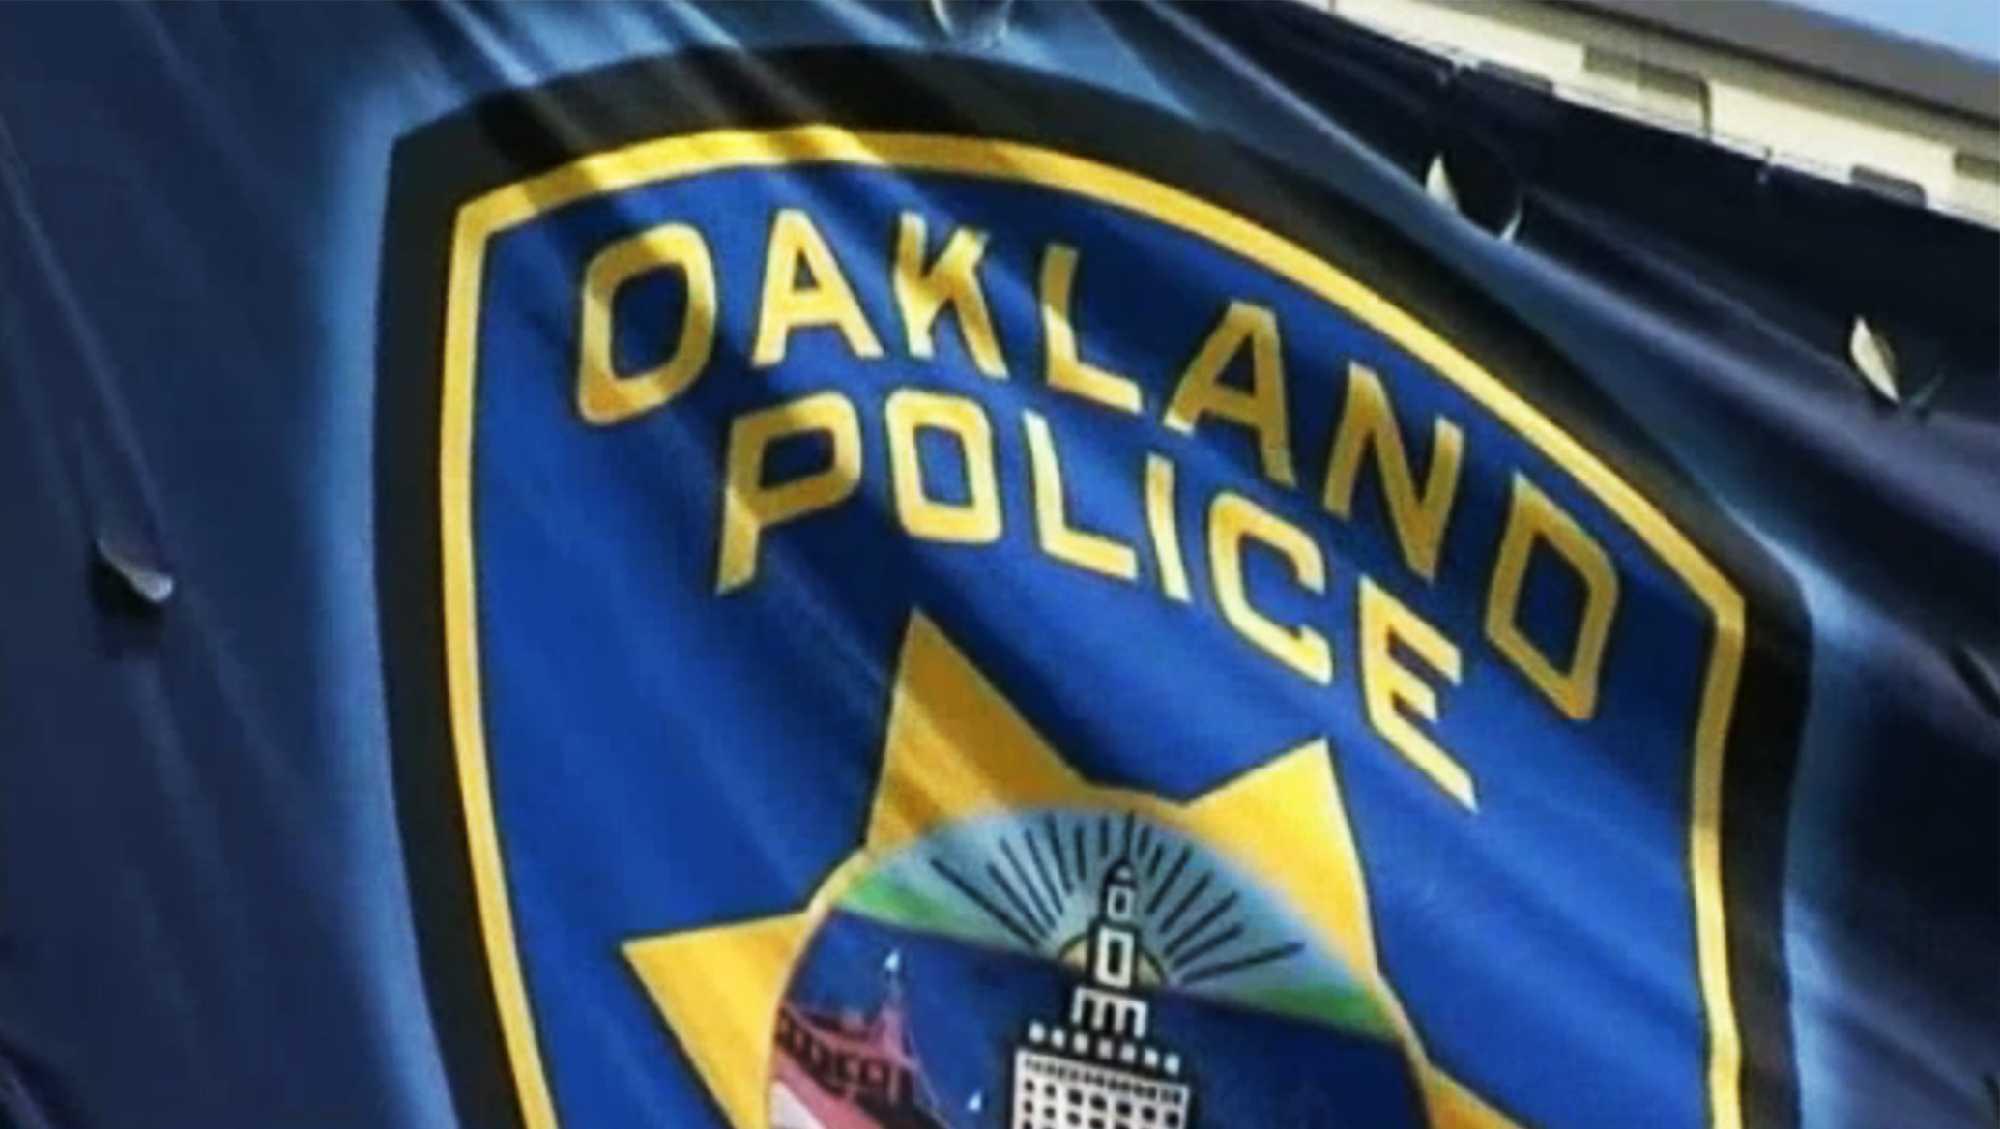 oakland police.jpg